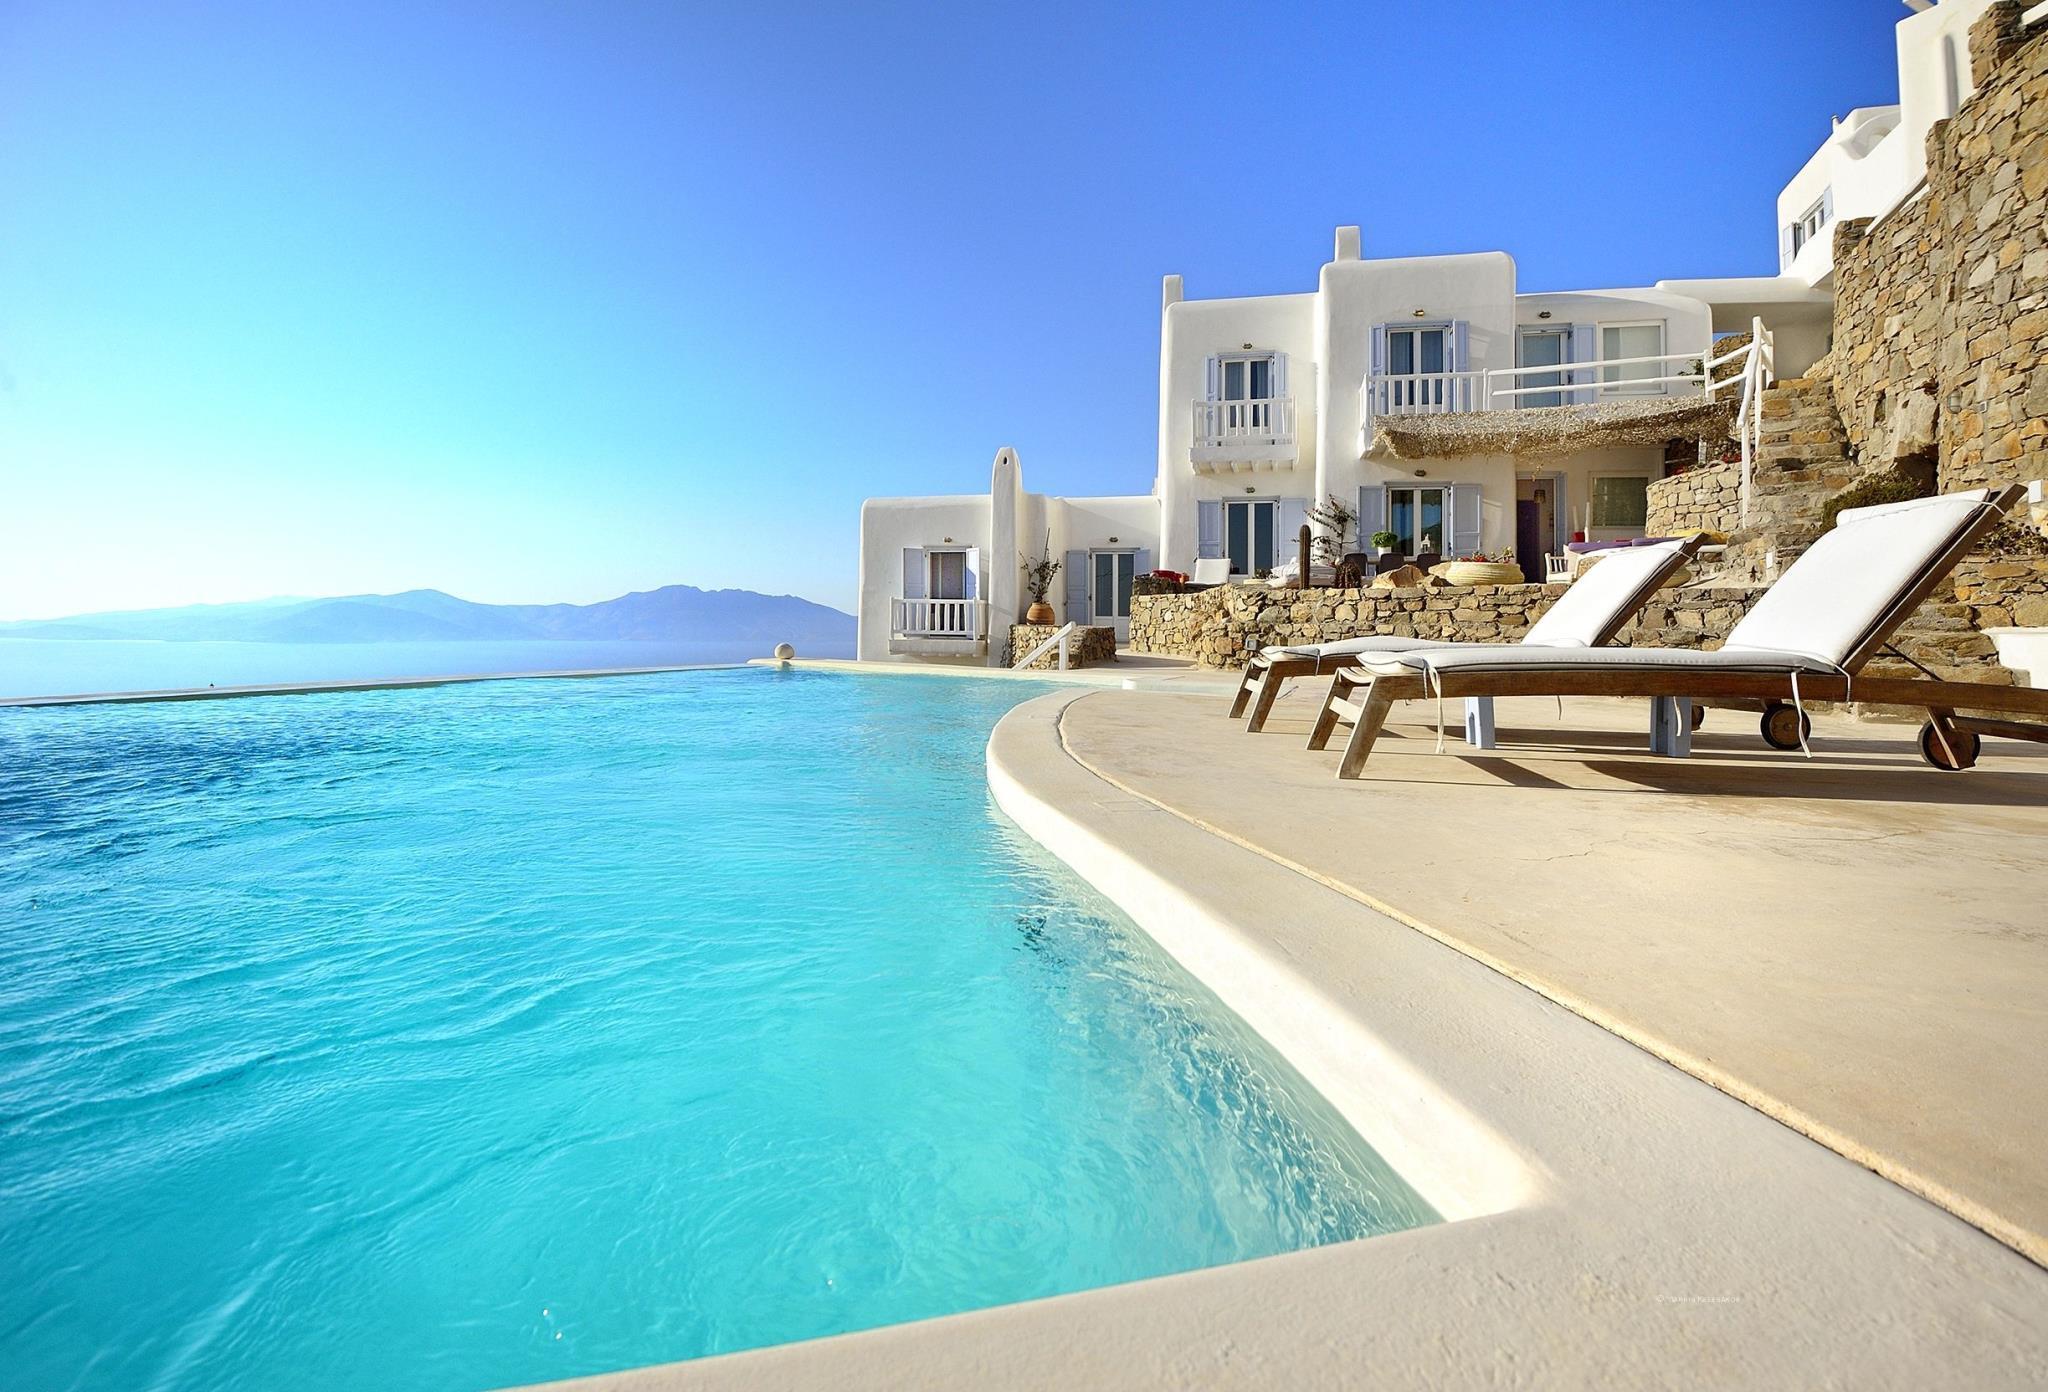 Mermaid Luxury Villas In Mykonos